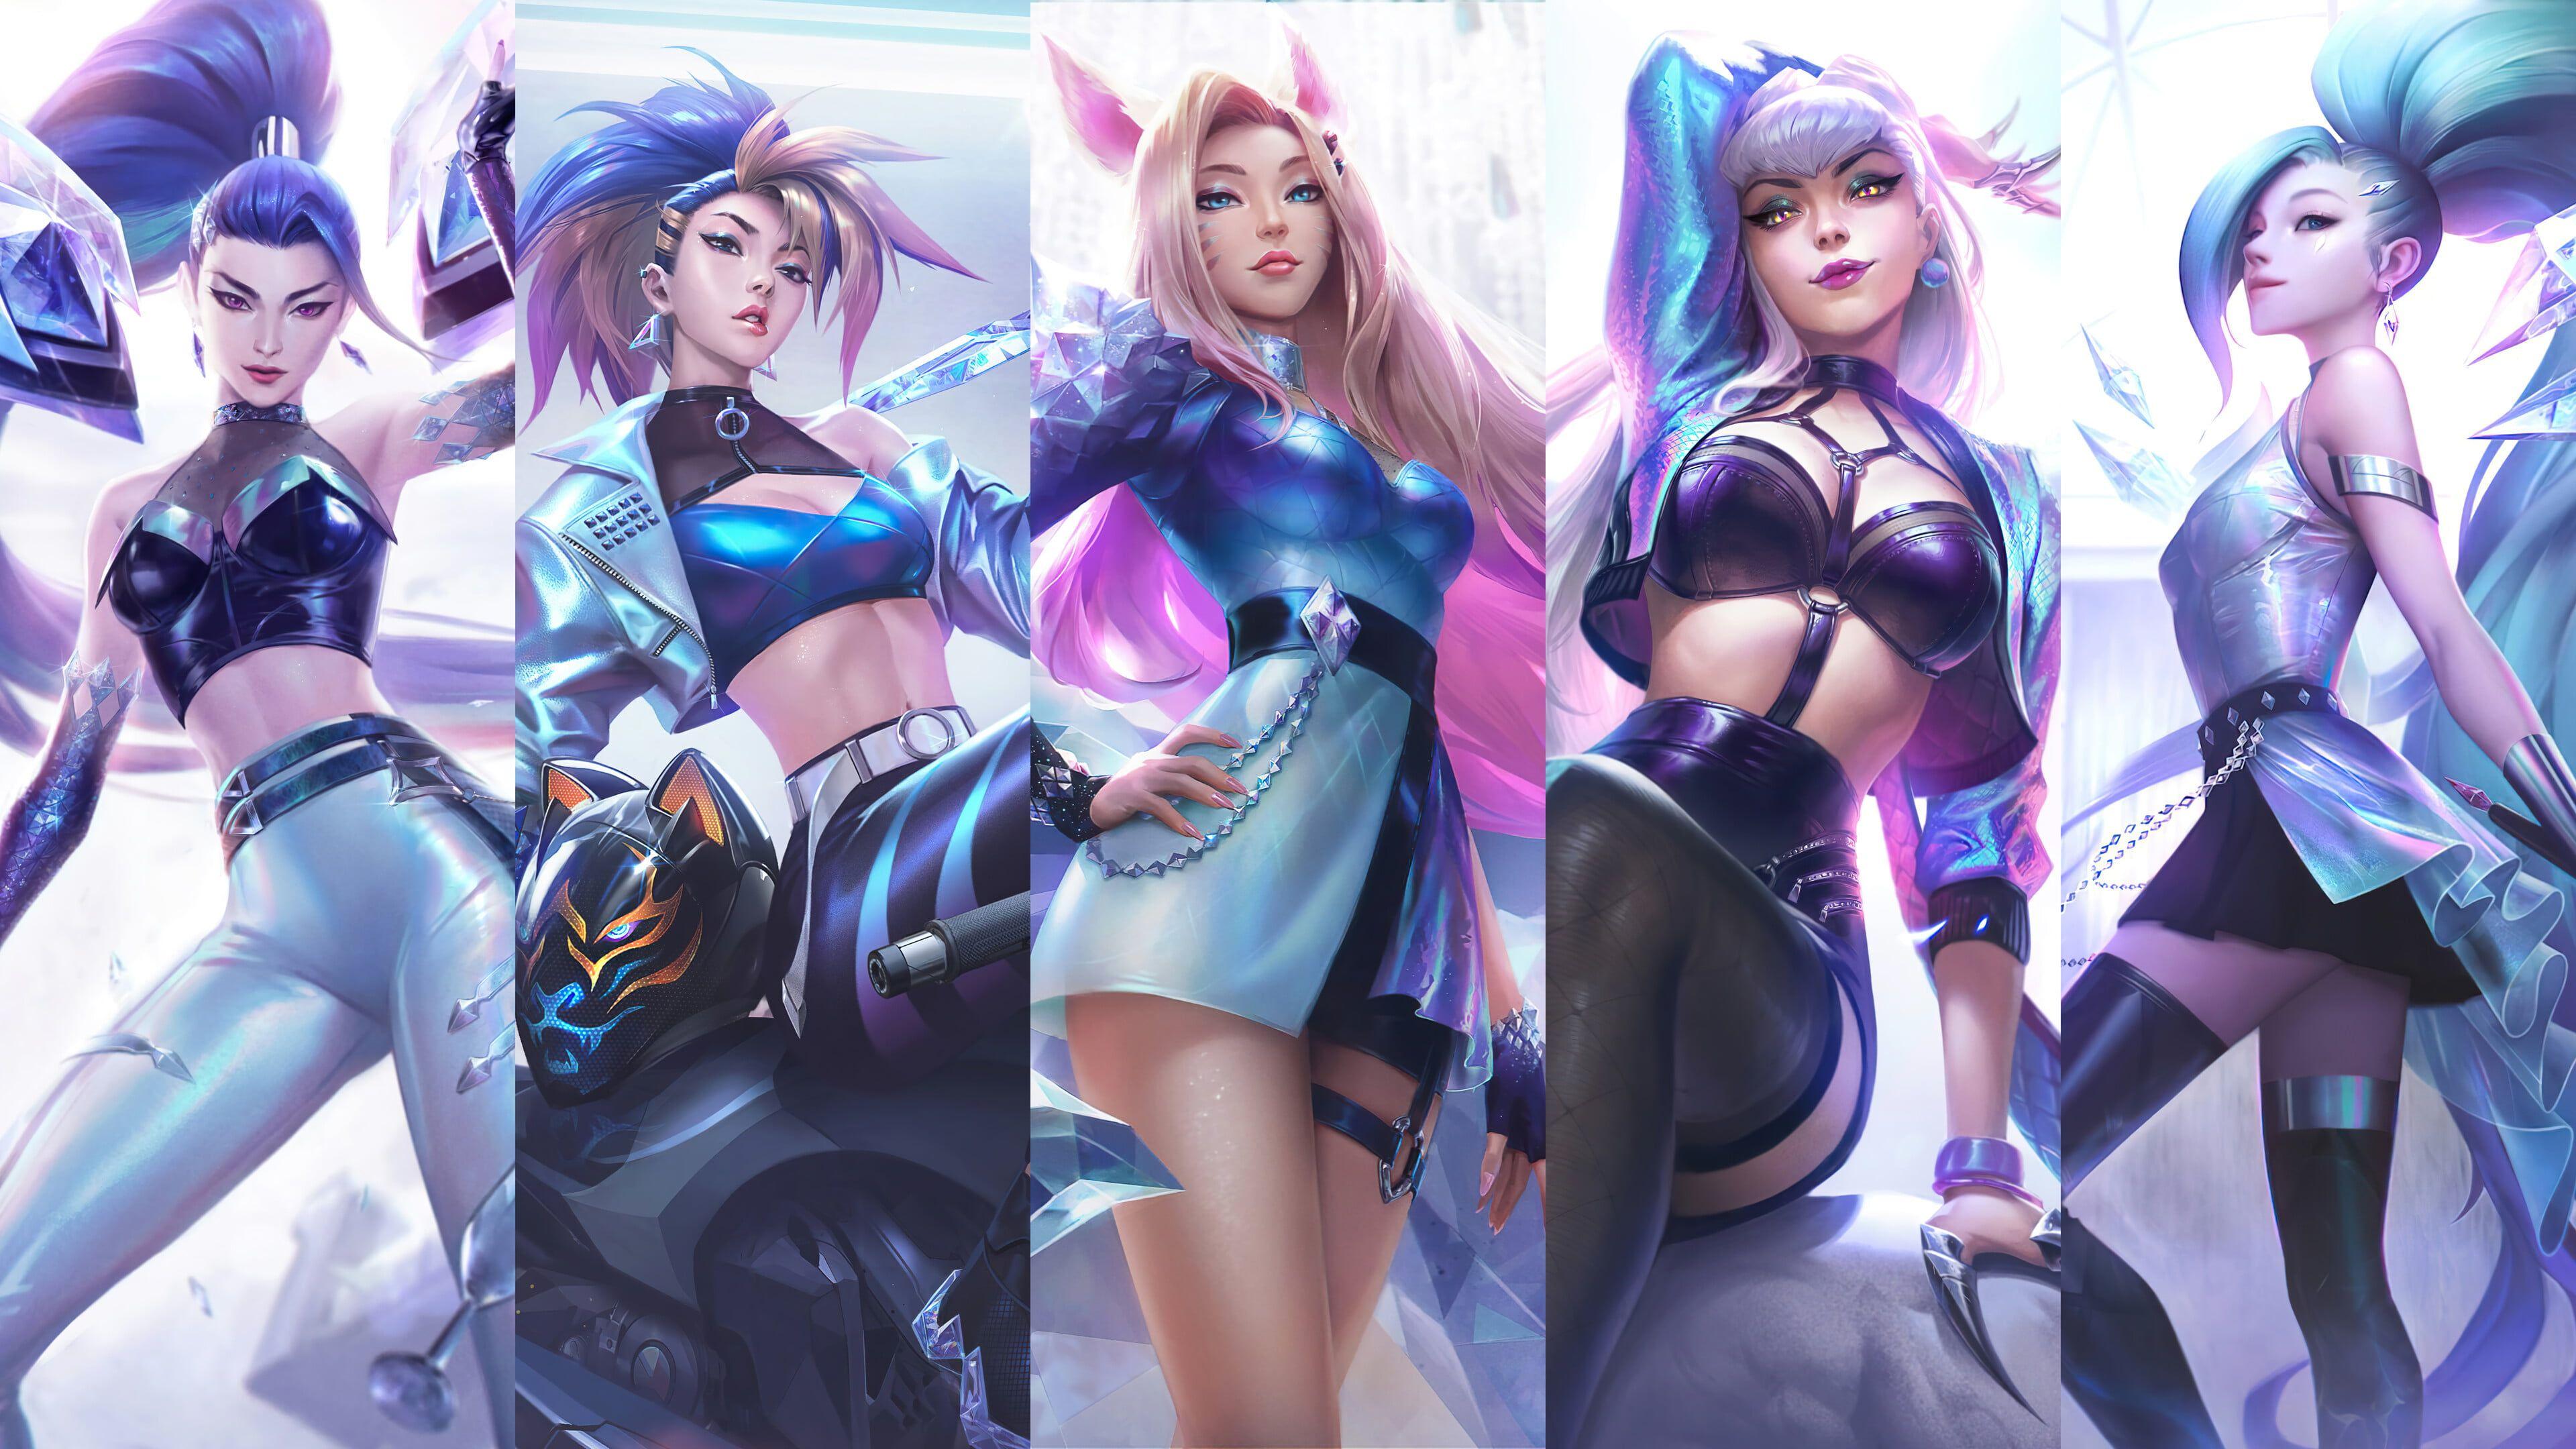 235abf26861442e2f9cad25bb68ccd47 - Kpop Wallpaper 4k - HD wallpaper: K/DA, kda, Seraphine (League of Legends), Evelynn, Evelynn (League of Legends)